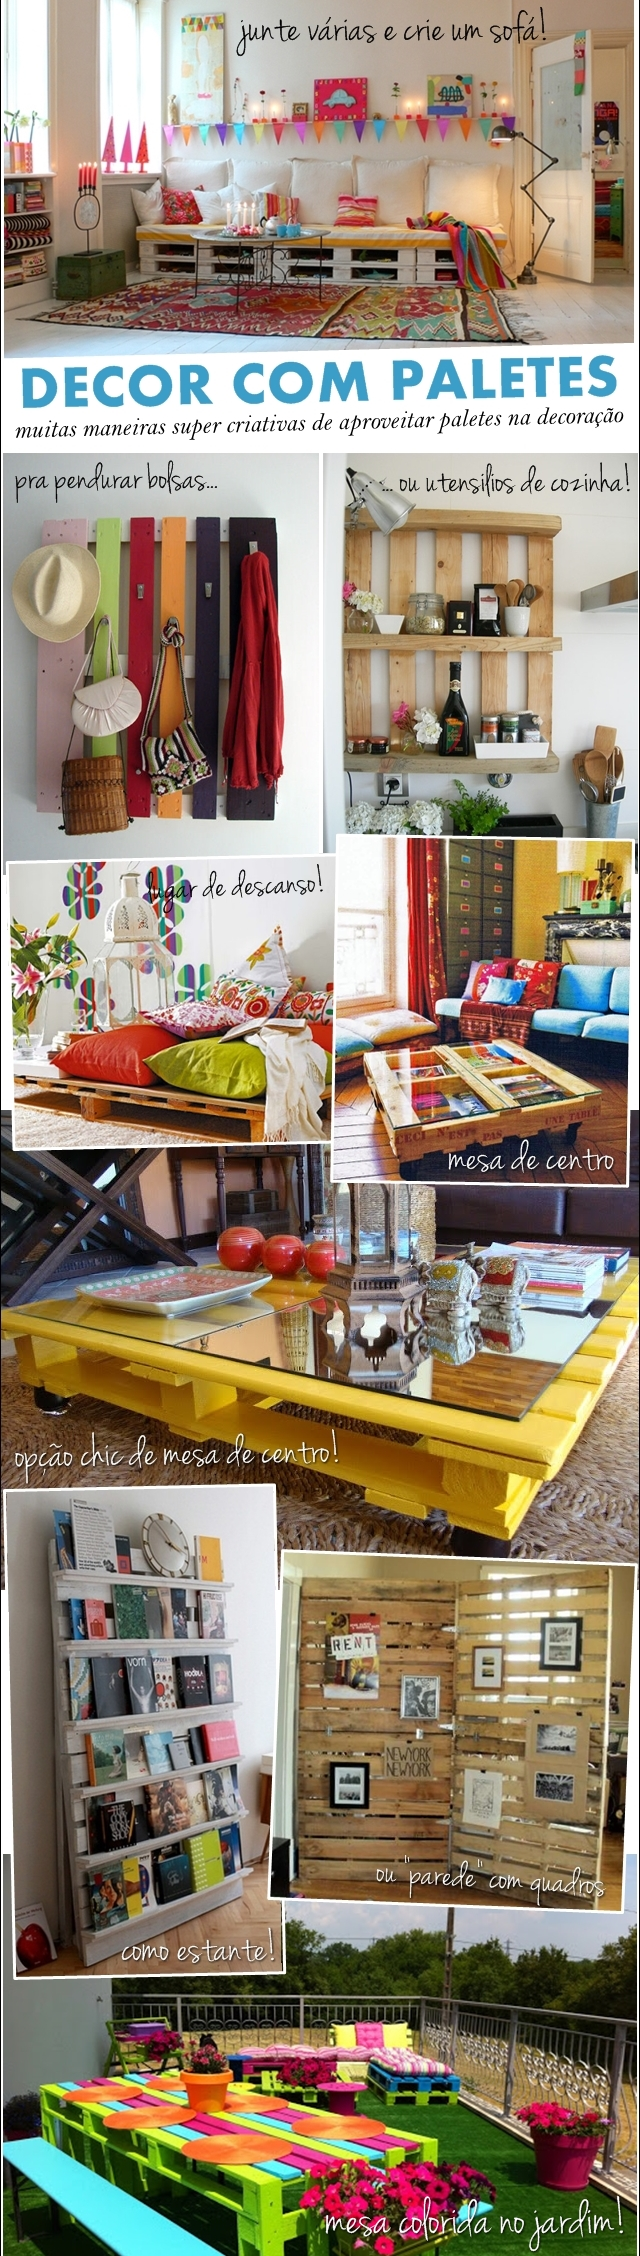 Mundo Lolita Decor Paletes Decor Pinterest Palets Reciclado  # Muebles Raros Del Mundo